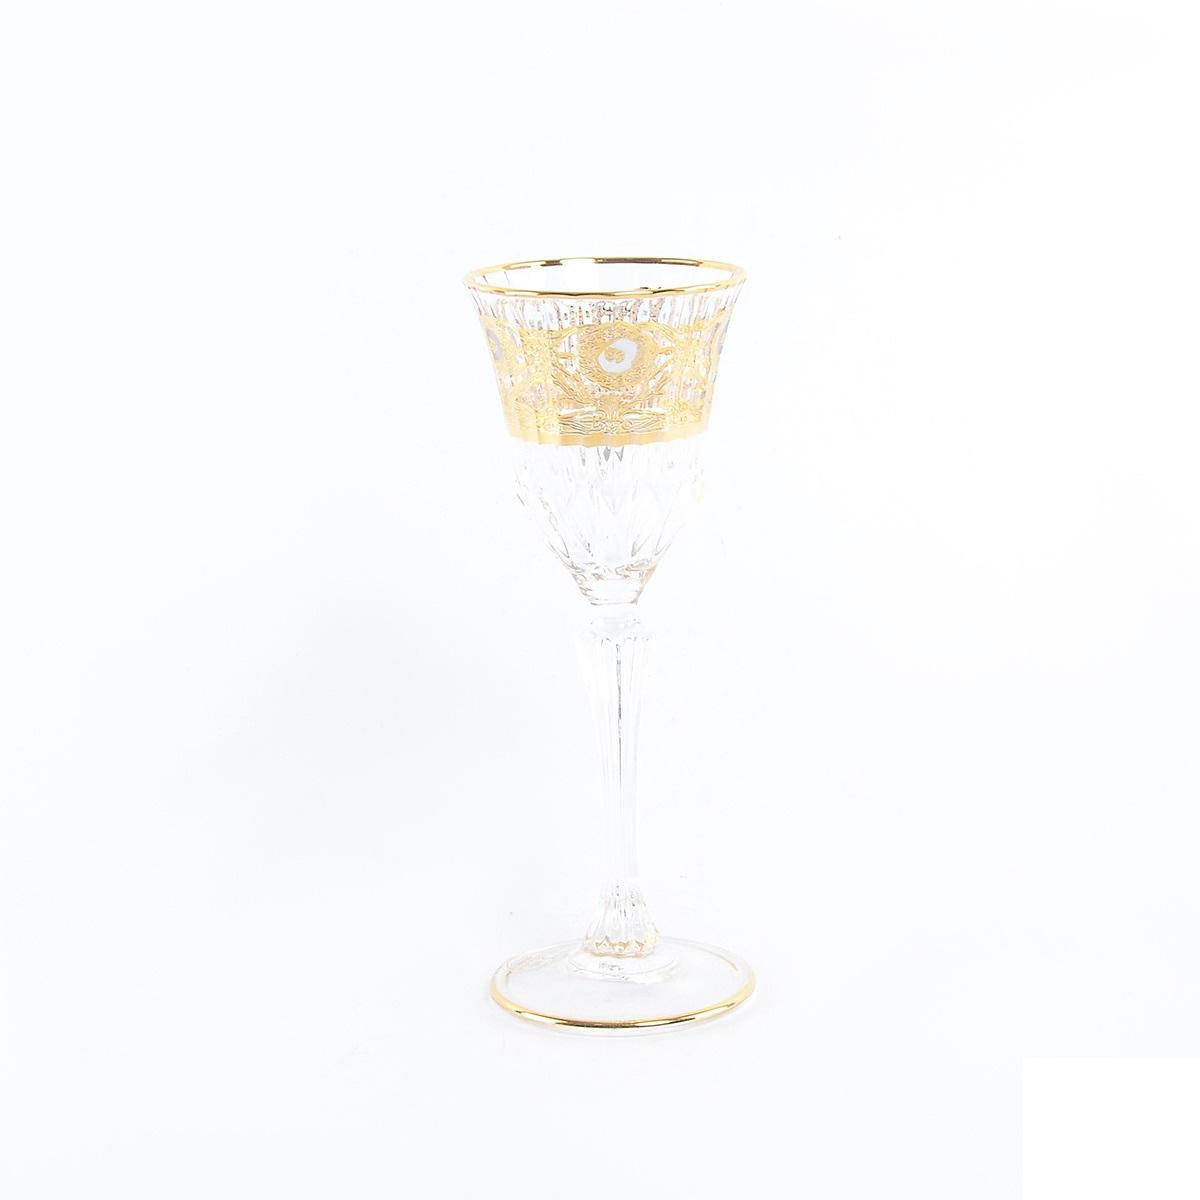 Набор рюмок для водки ADAGIO от TIMON, хрусталь, 6 шт.